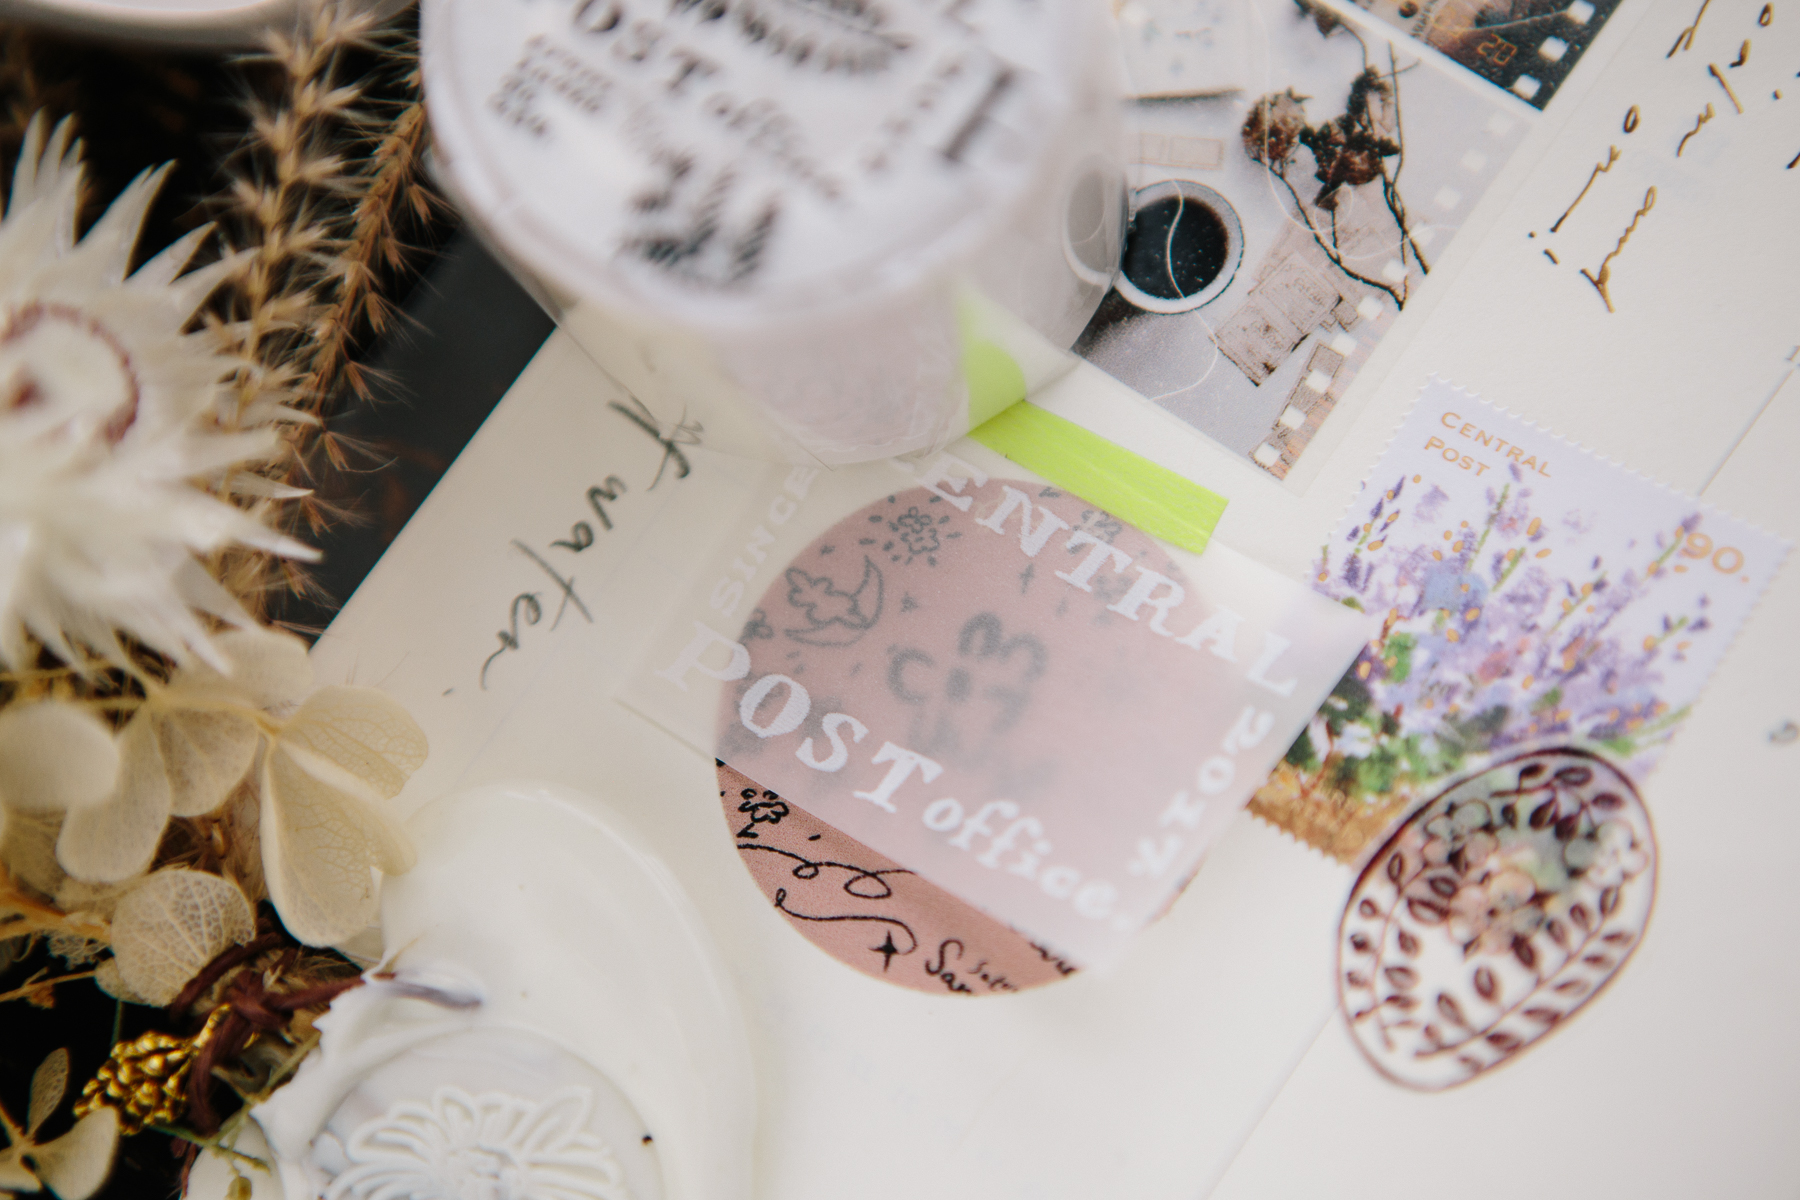 OURS 森林郵務 描圖紙卷